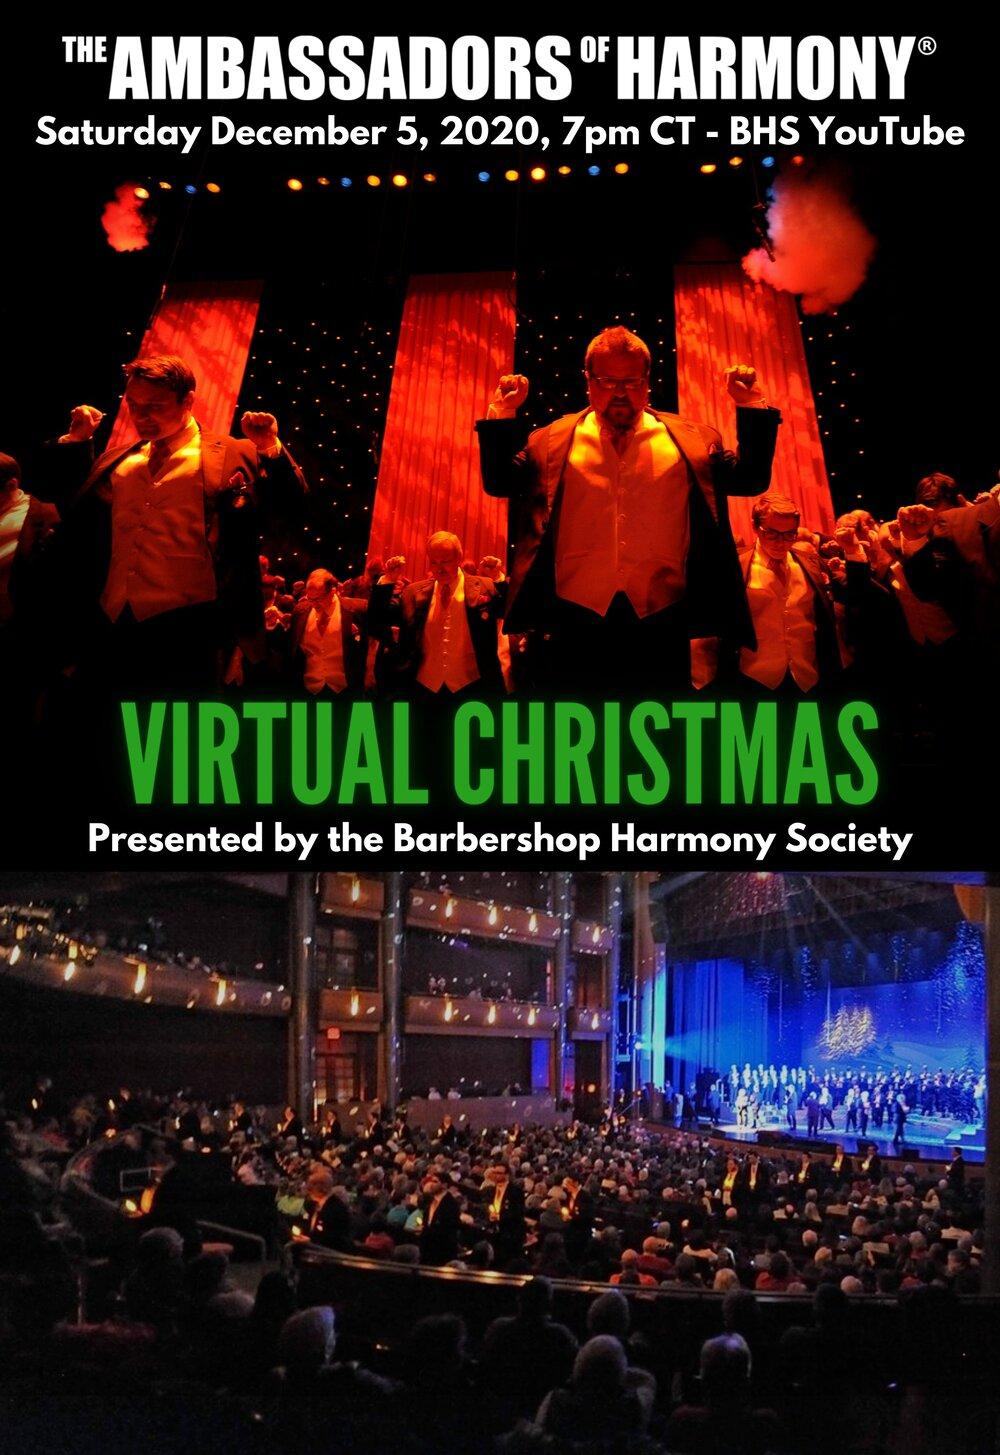 Awesome 2020 Christmas Performance, St. Charles, Mo The Ambassadors of Harmony